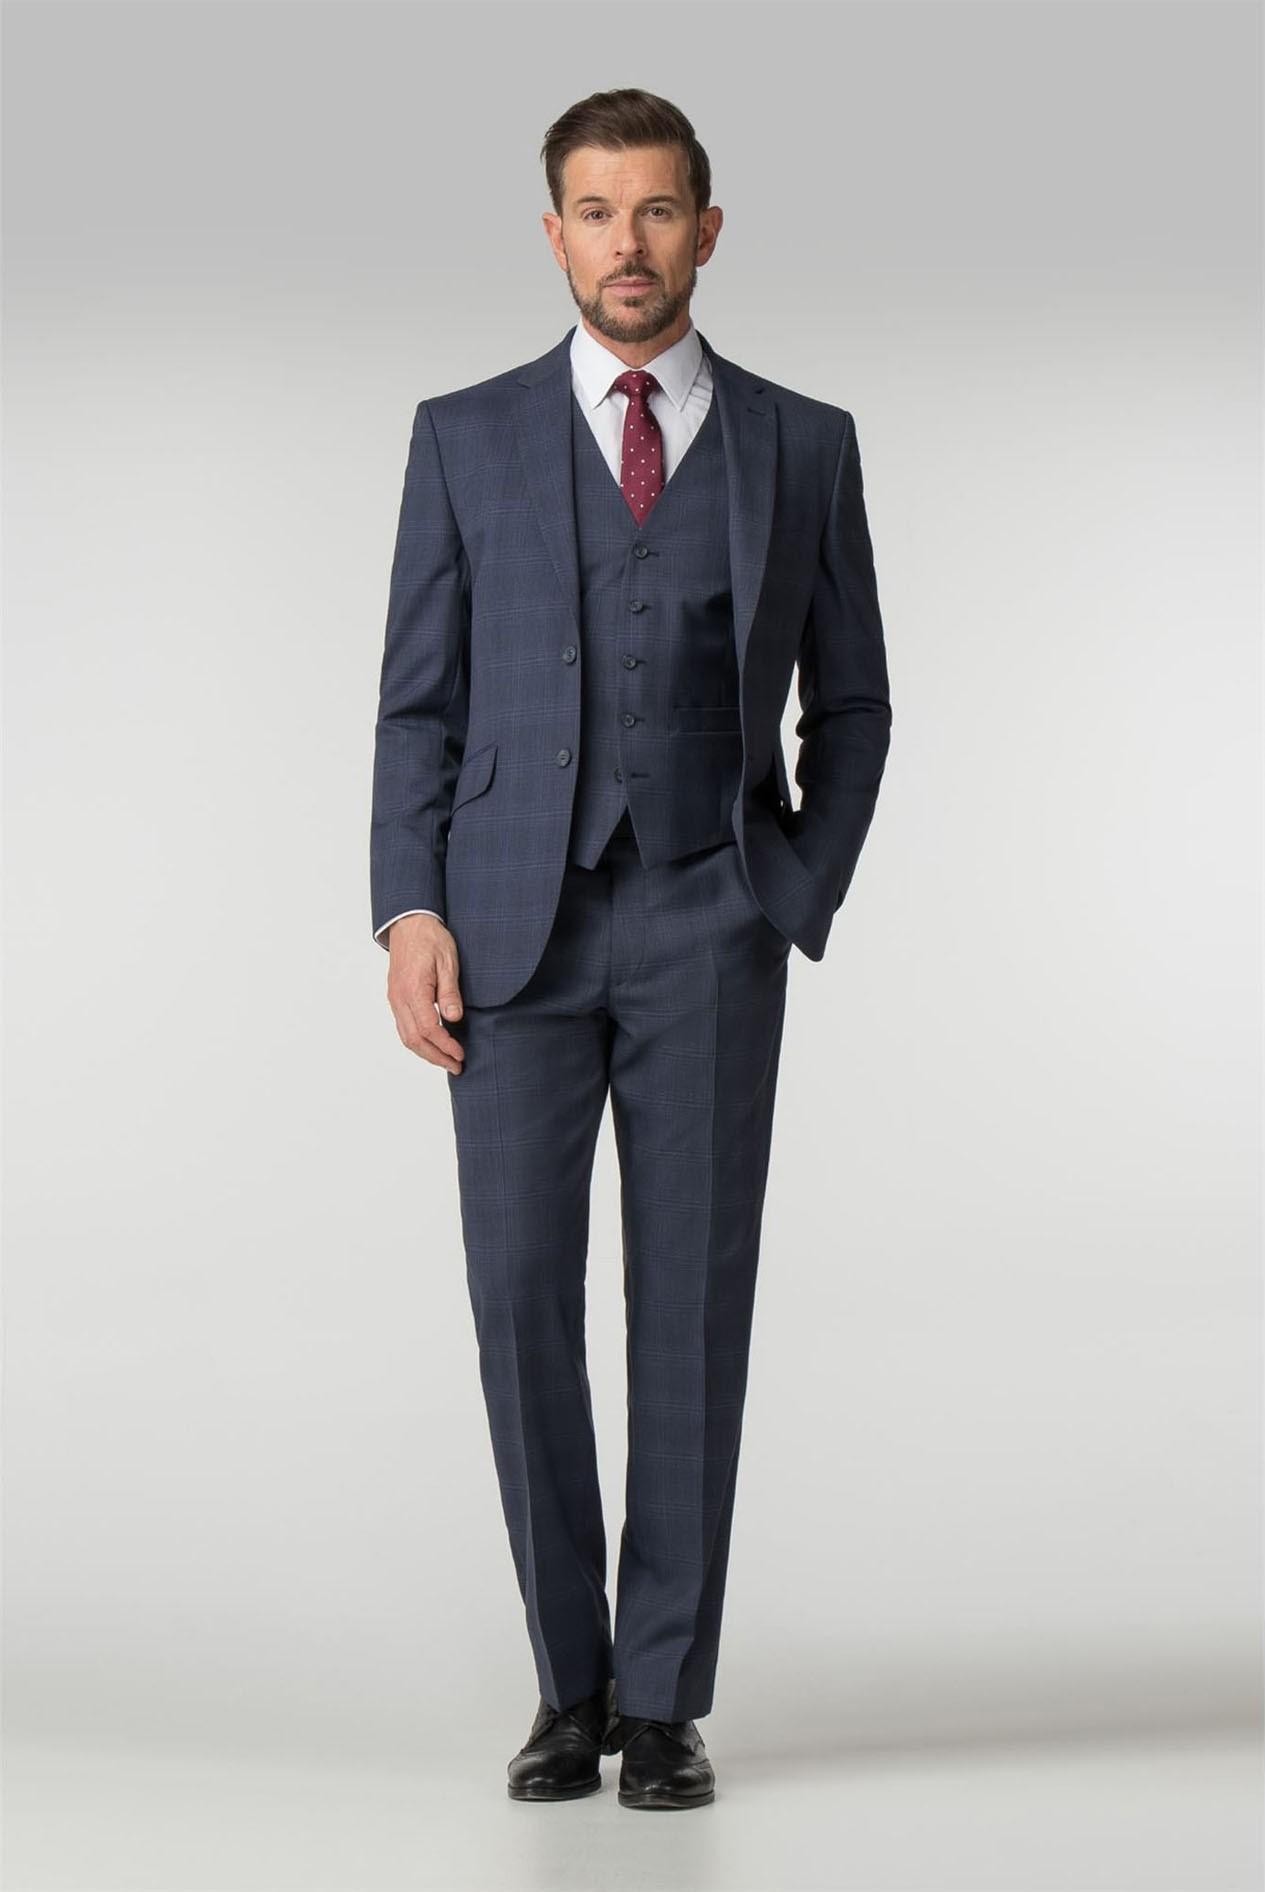 Men/'s Pierre Cardin Suit Tailored Fit Wool Blend Brown